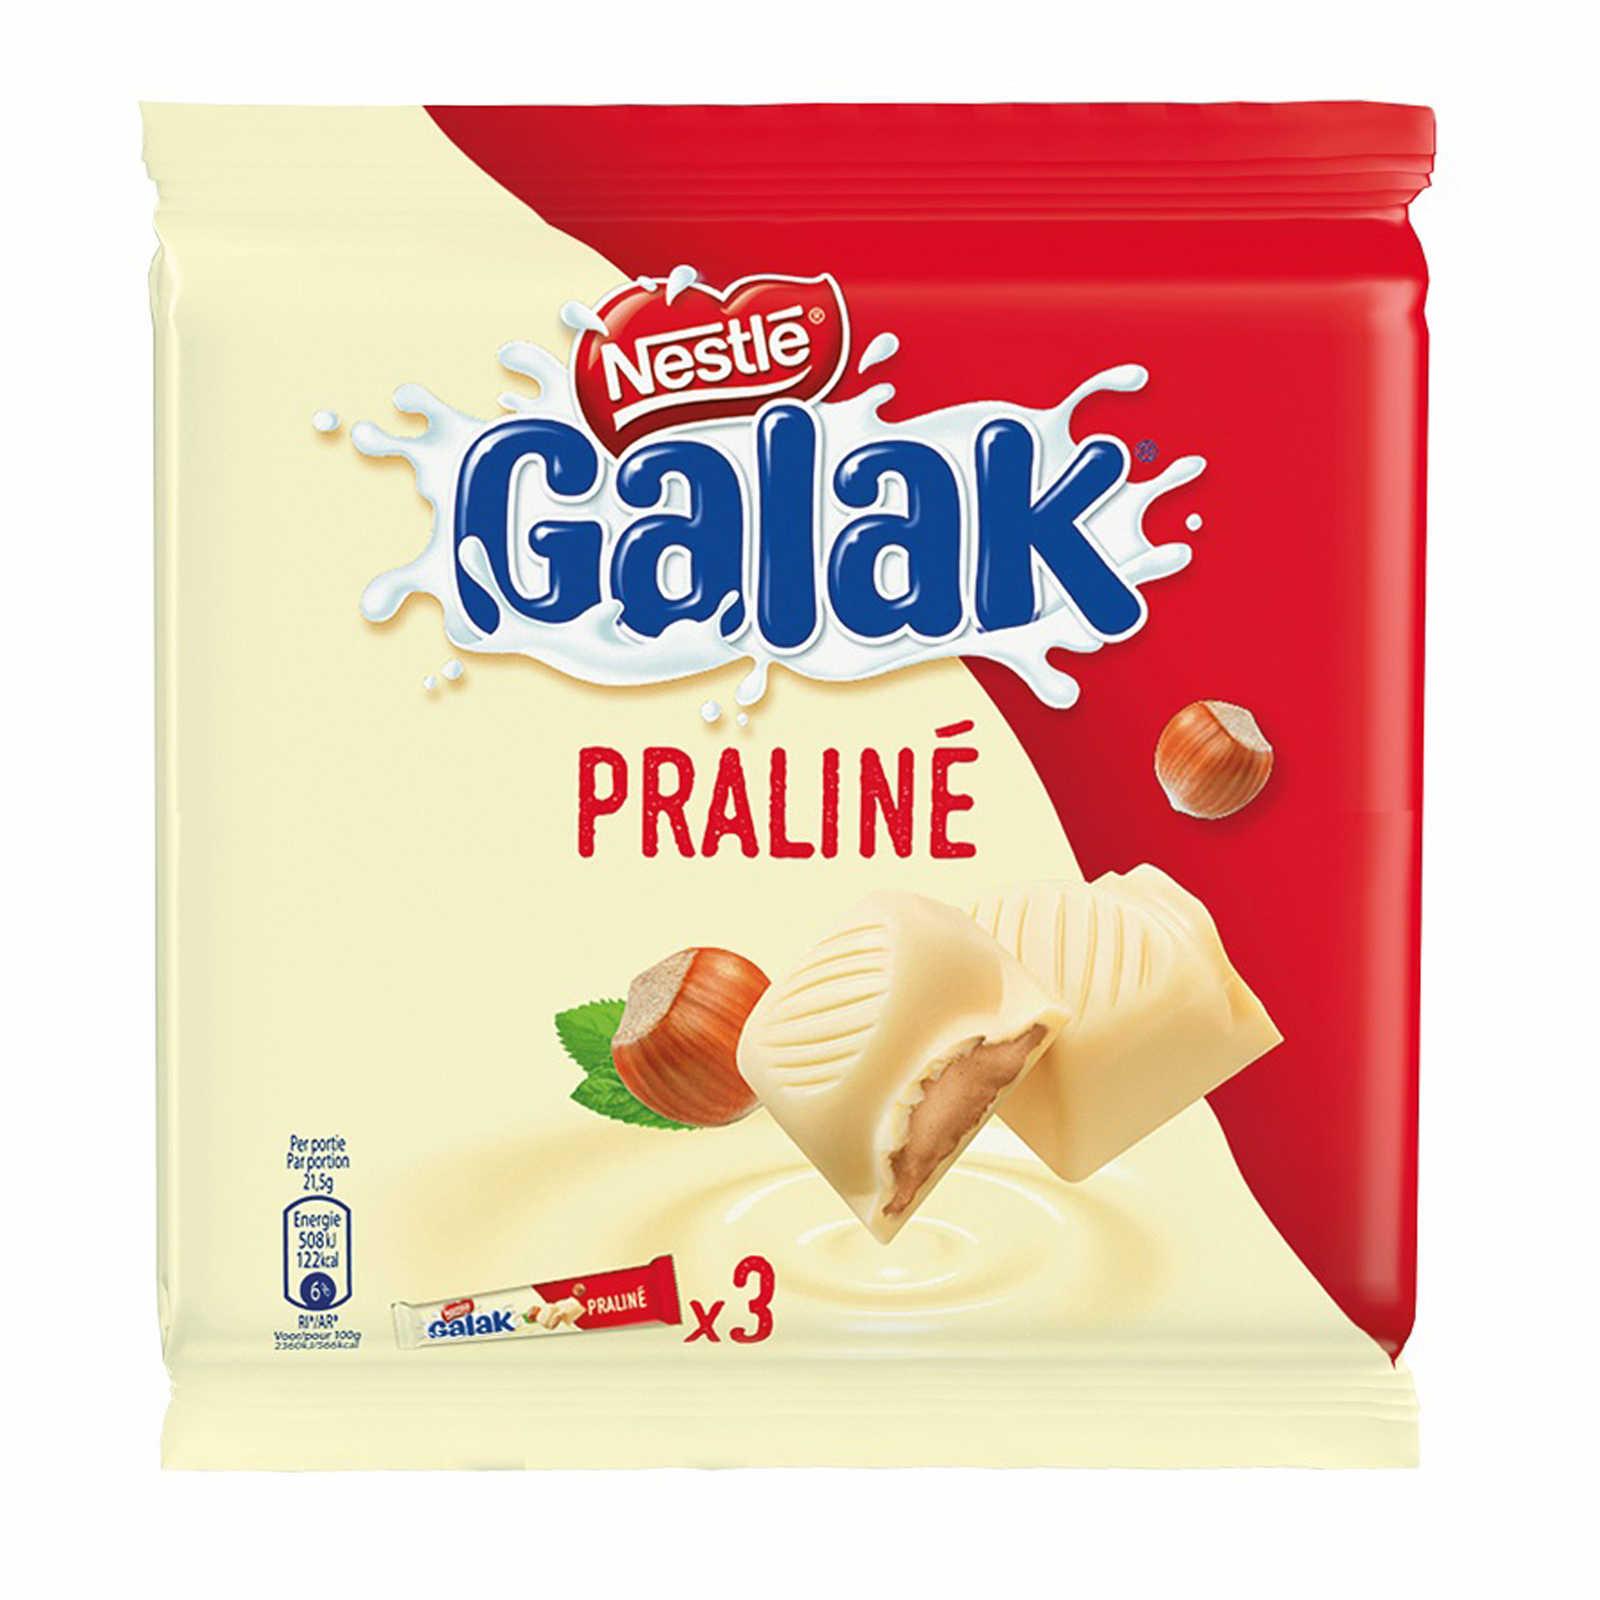 Nestlé-Galak